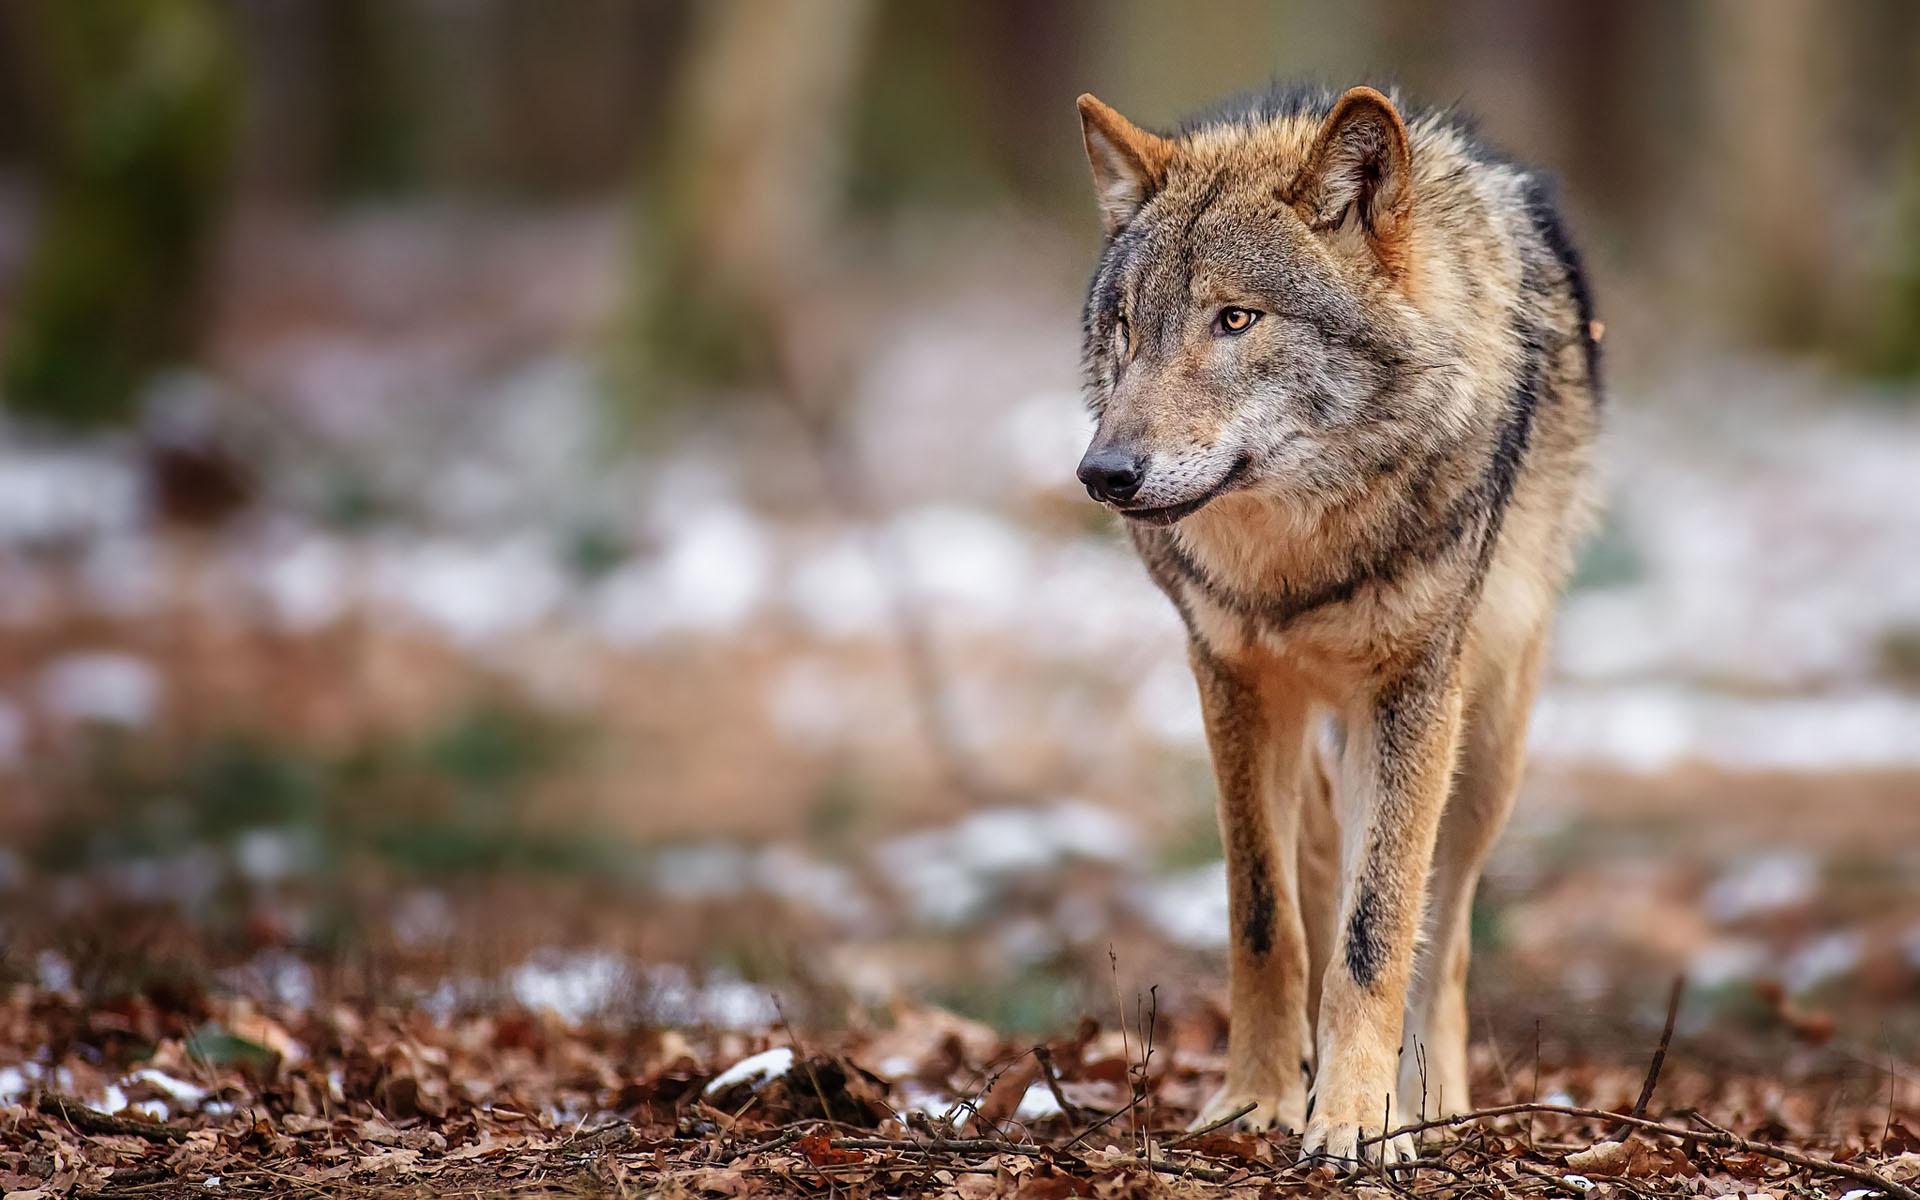 Hd Wolf Backgrounds: Wolf Wallpaper Hd